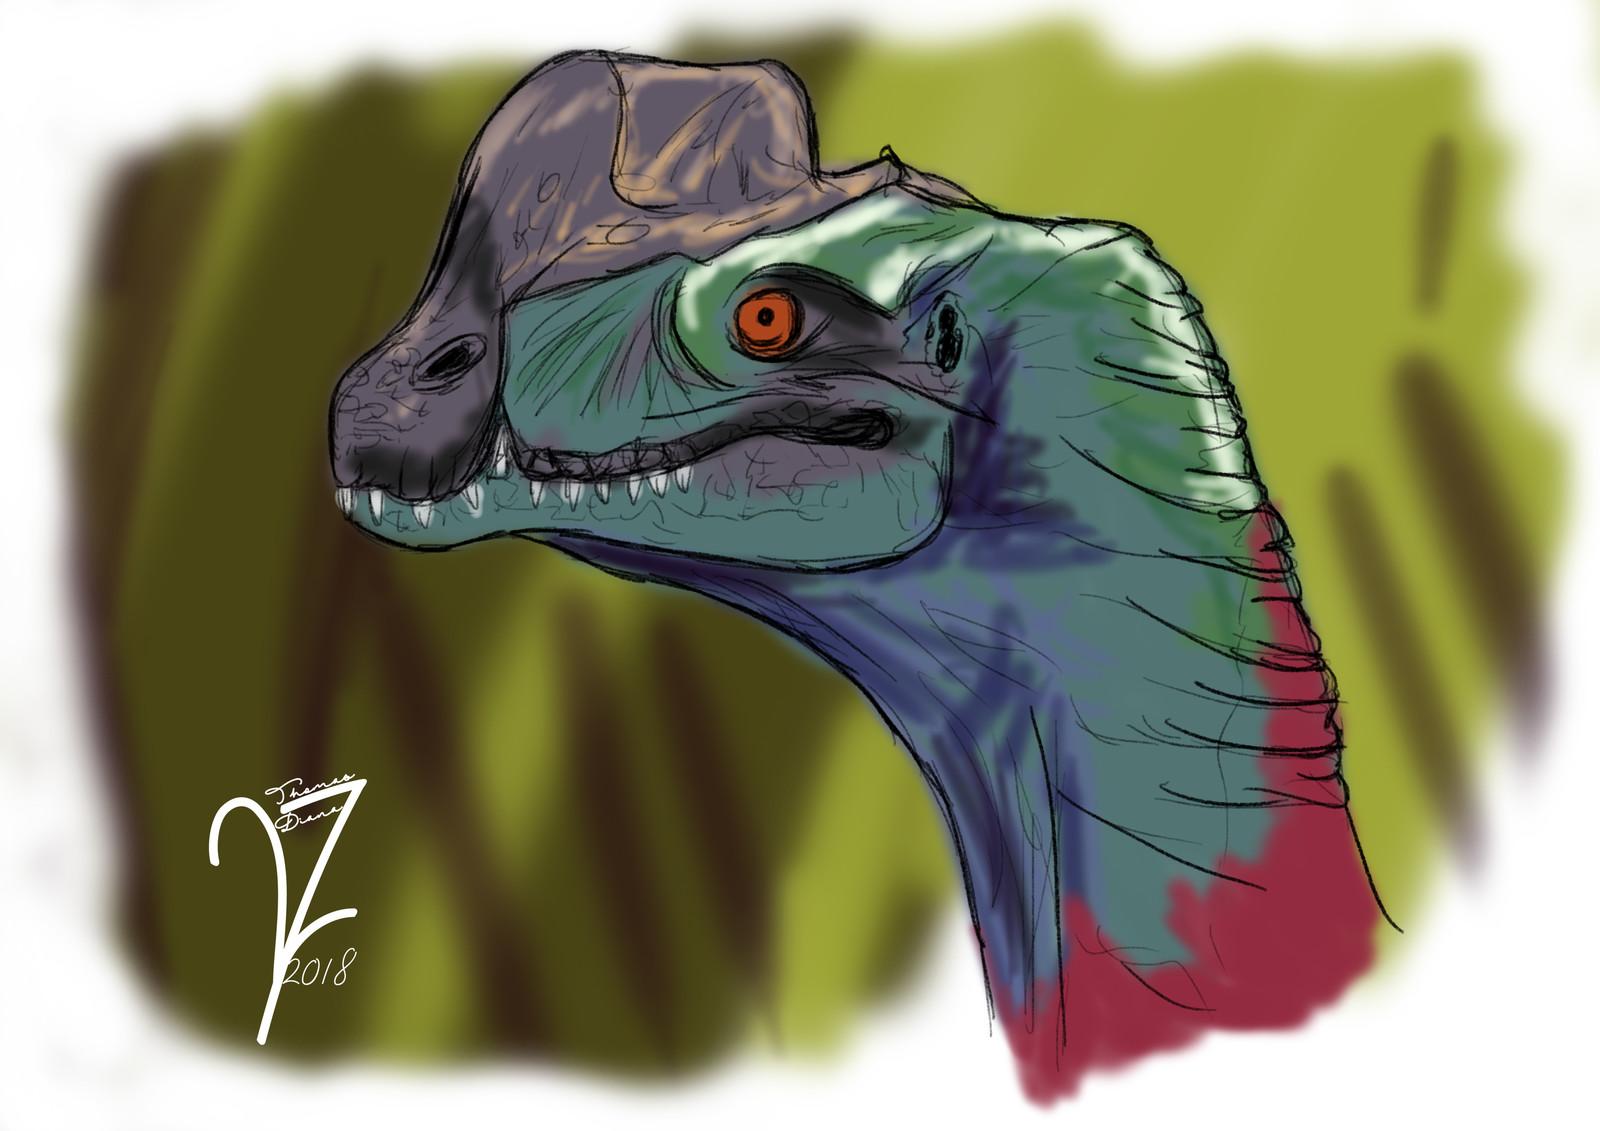 Casoarosaurus